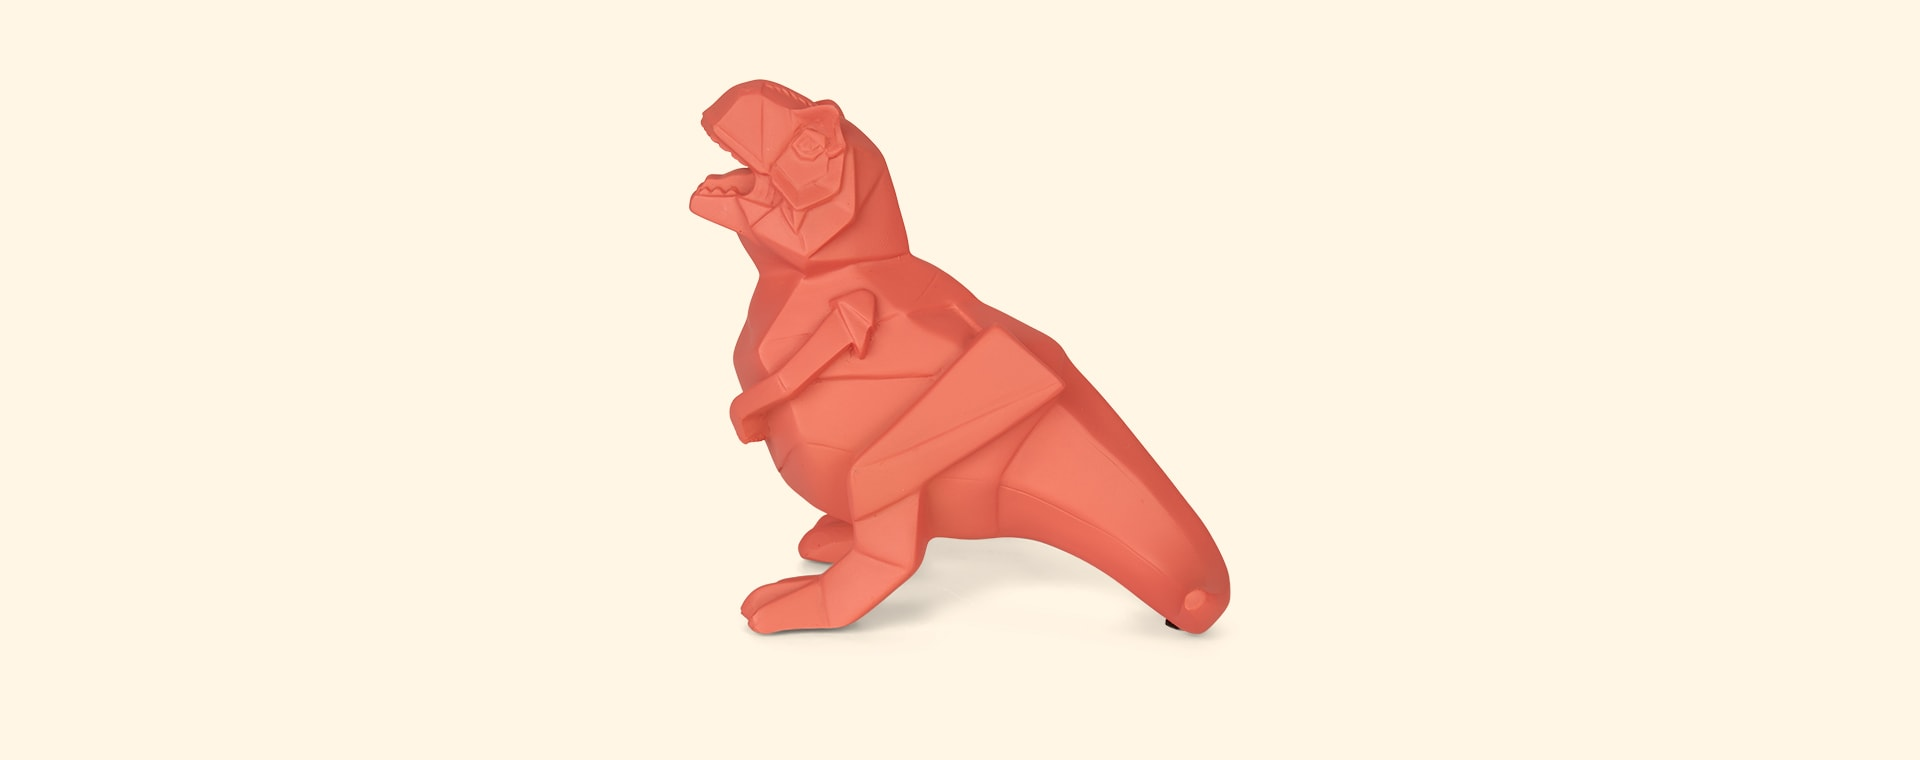 T-Rex House of Disaster Origami Dinosaur LED Lamp